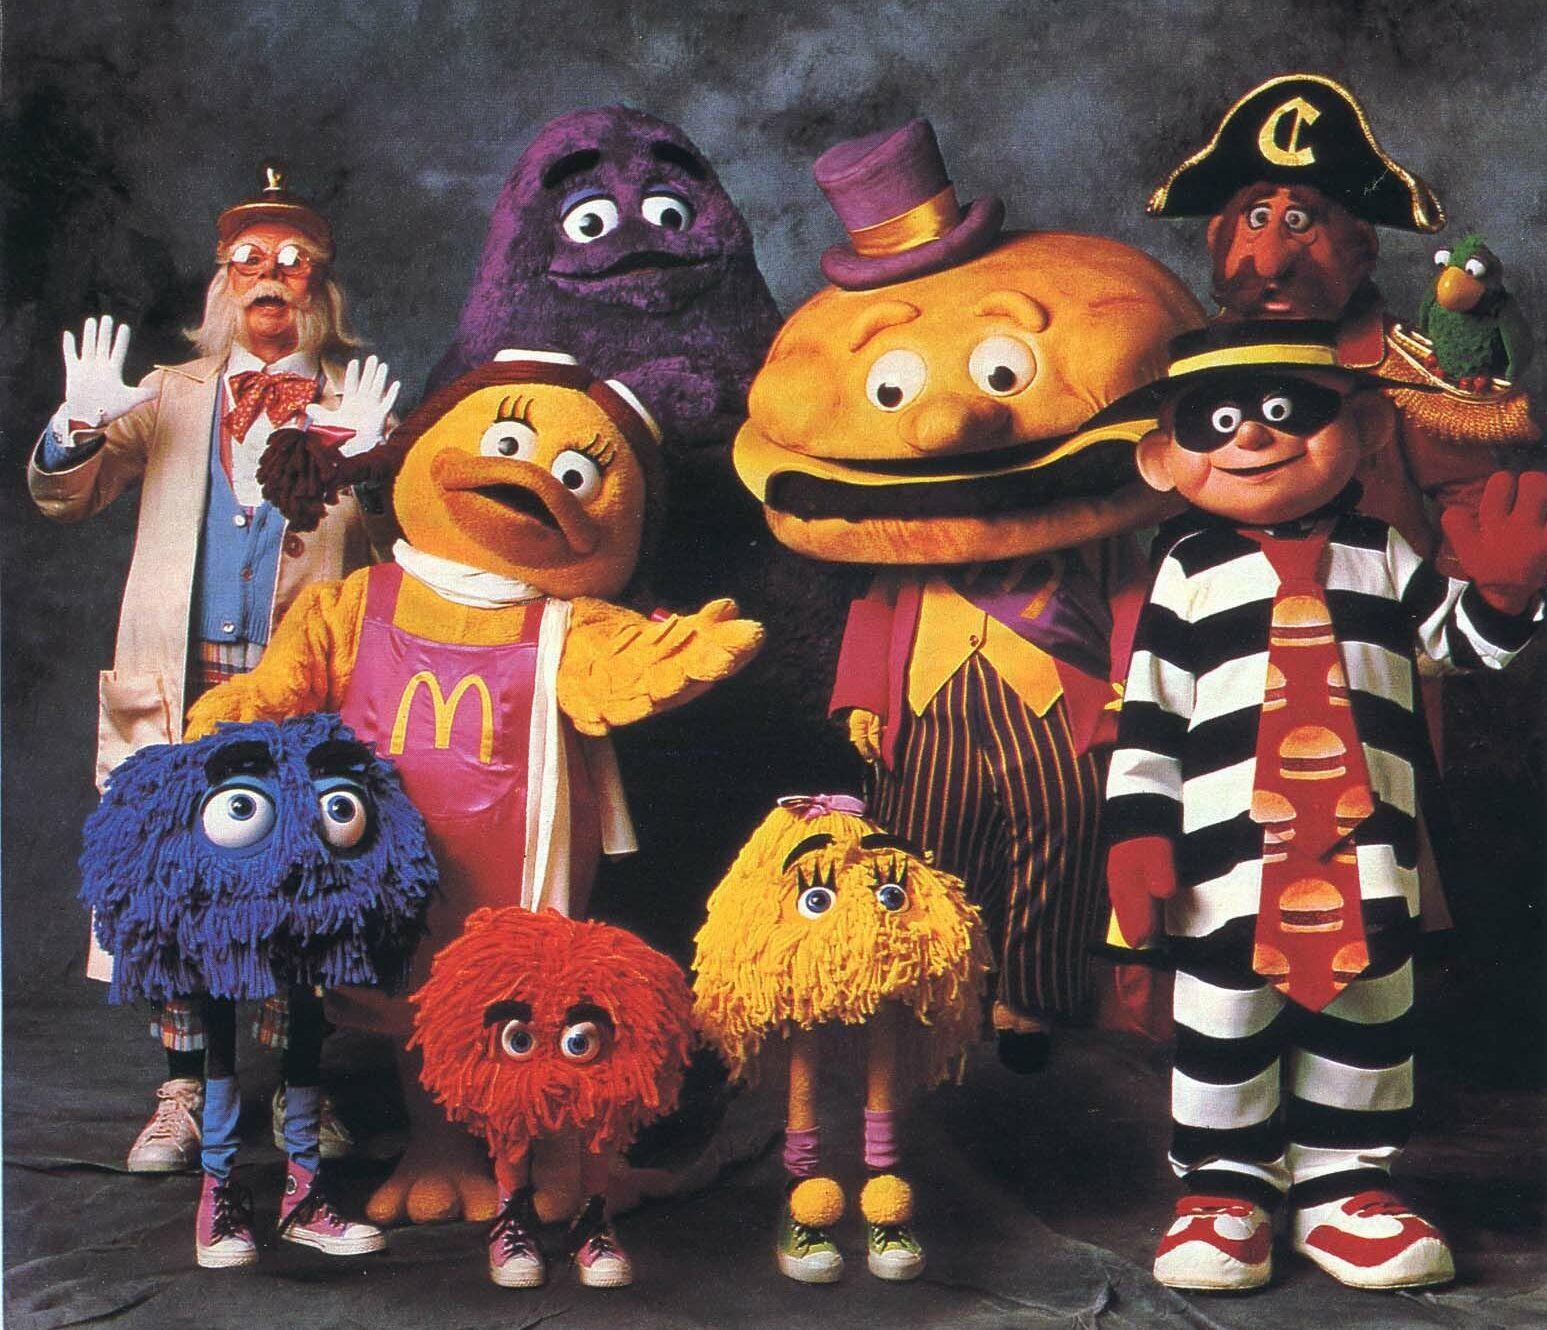 The Professor McDonald's characters